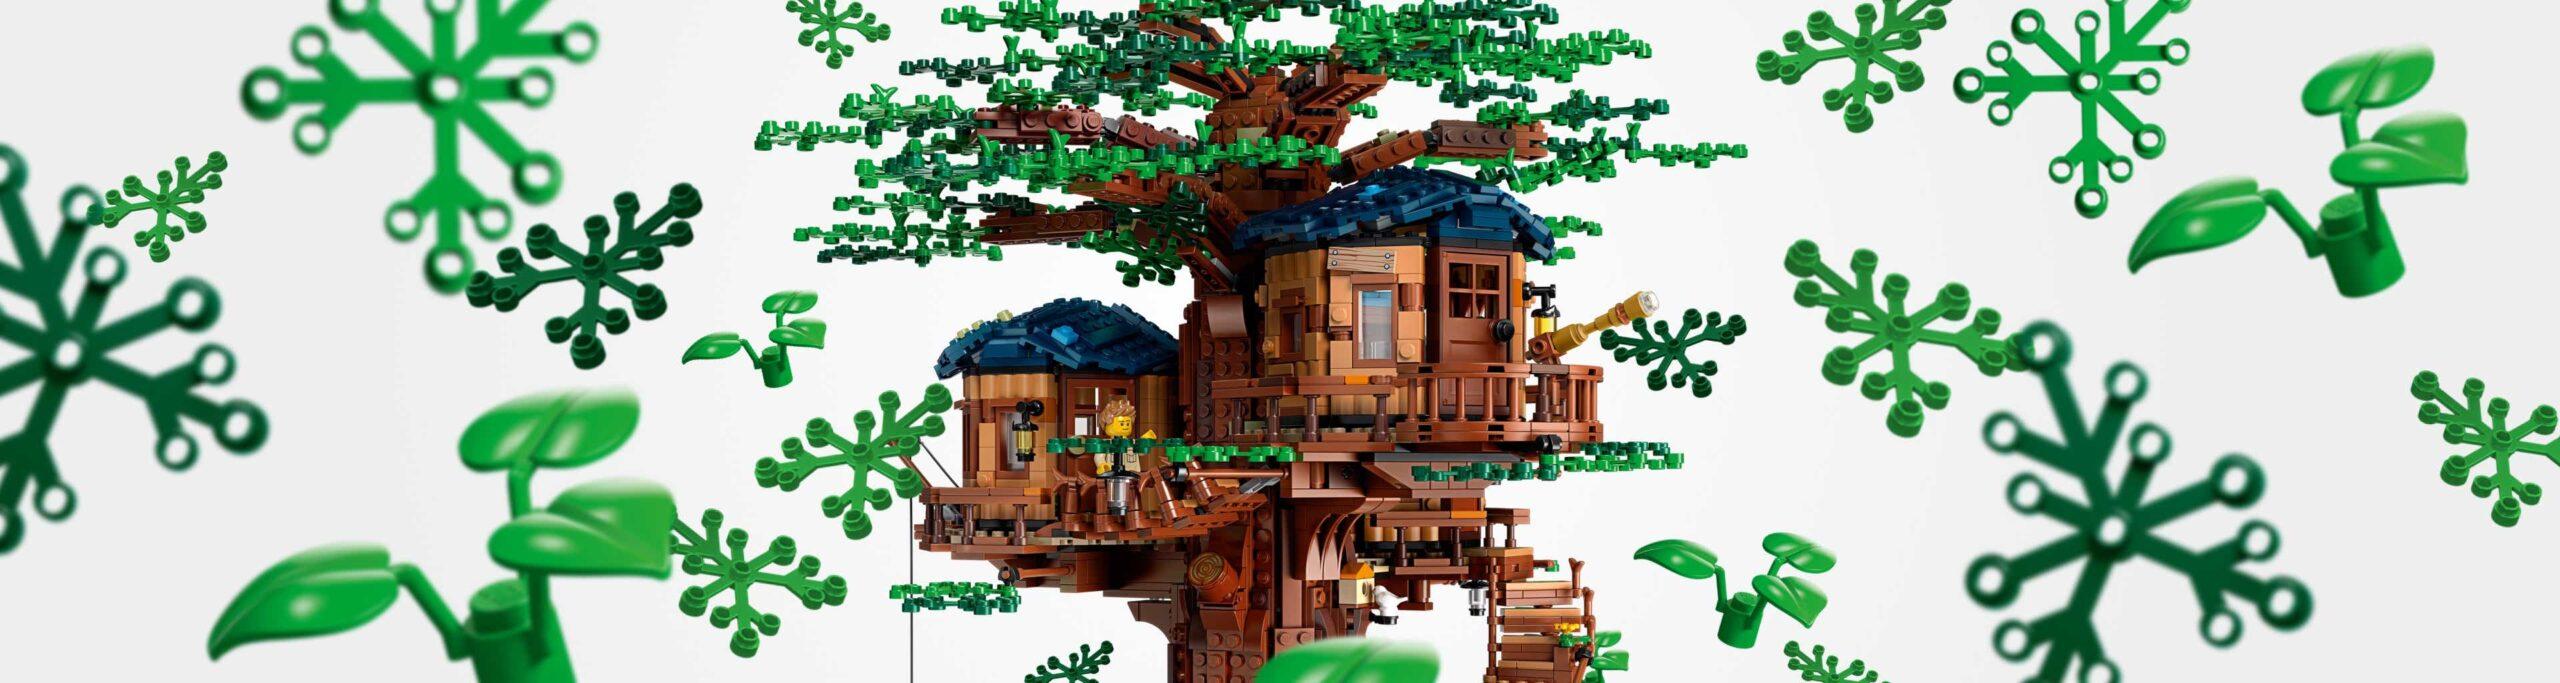 LEGO rezygnuje z plastiku